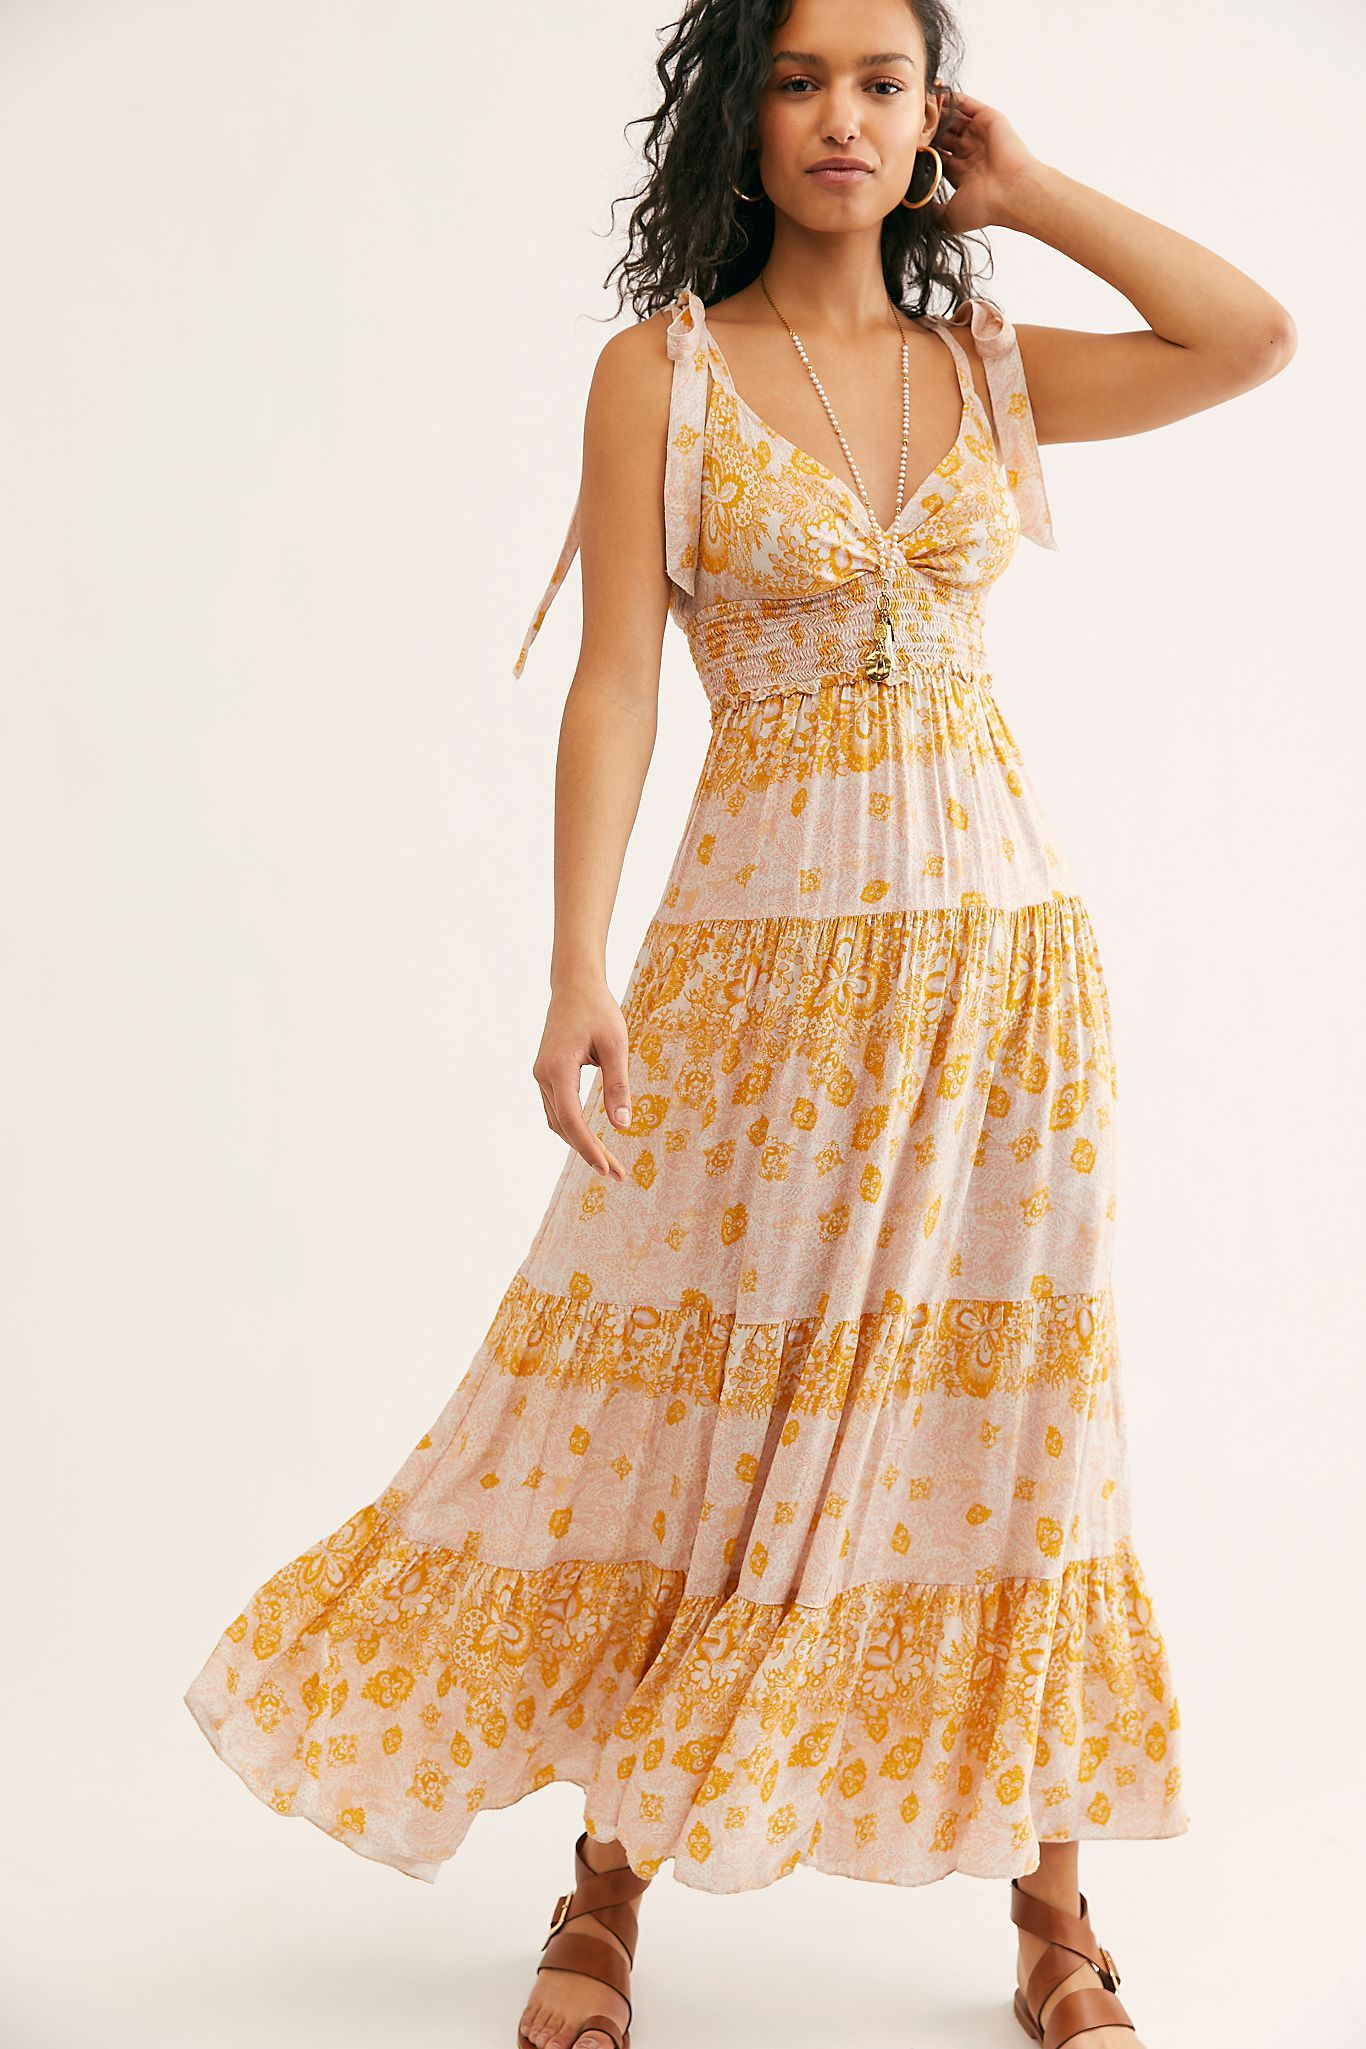 Santa Maria Maxi Dress Elegant Dresses For Women Fashion Ebay Dresses [ 2049 x 1366 Pixel ]